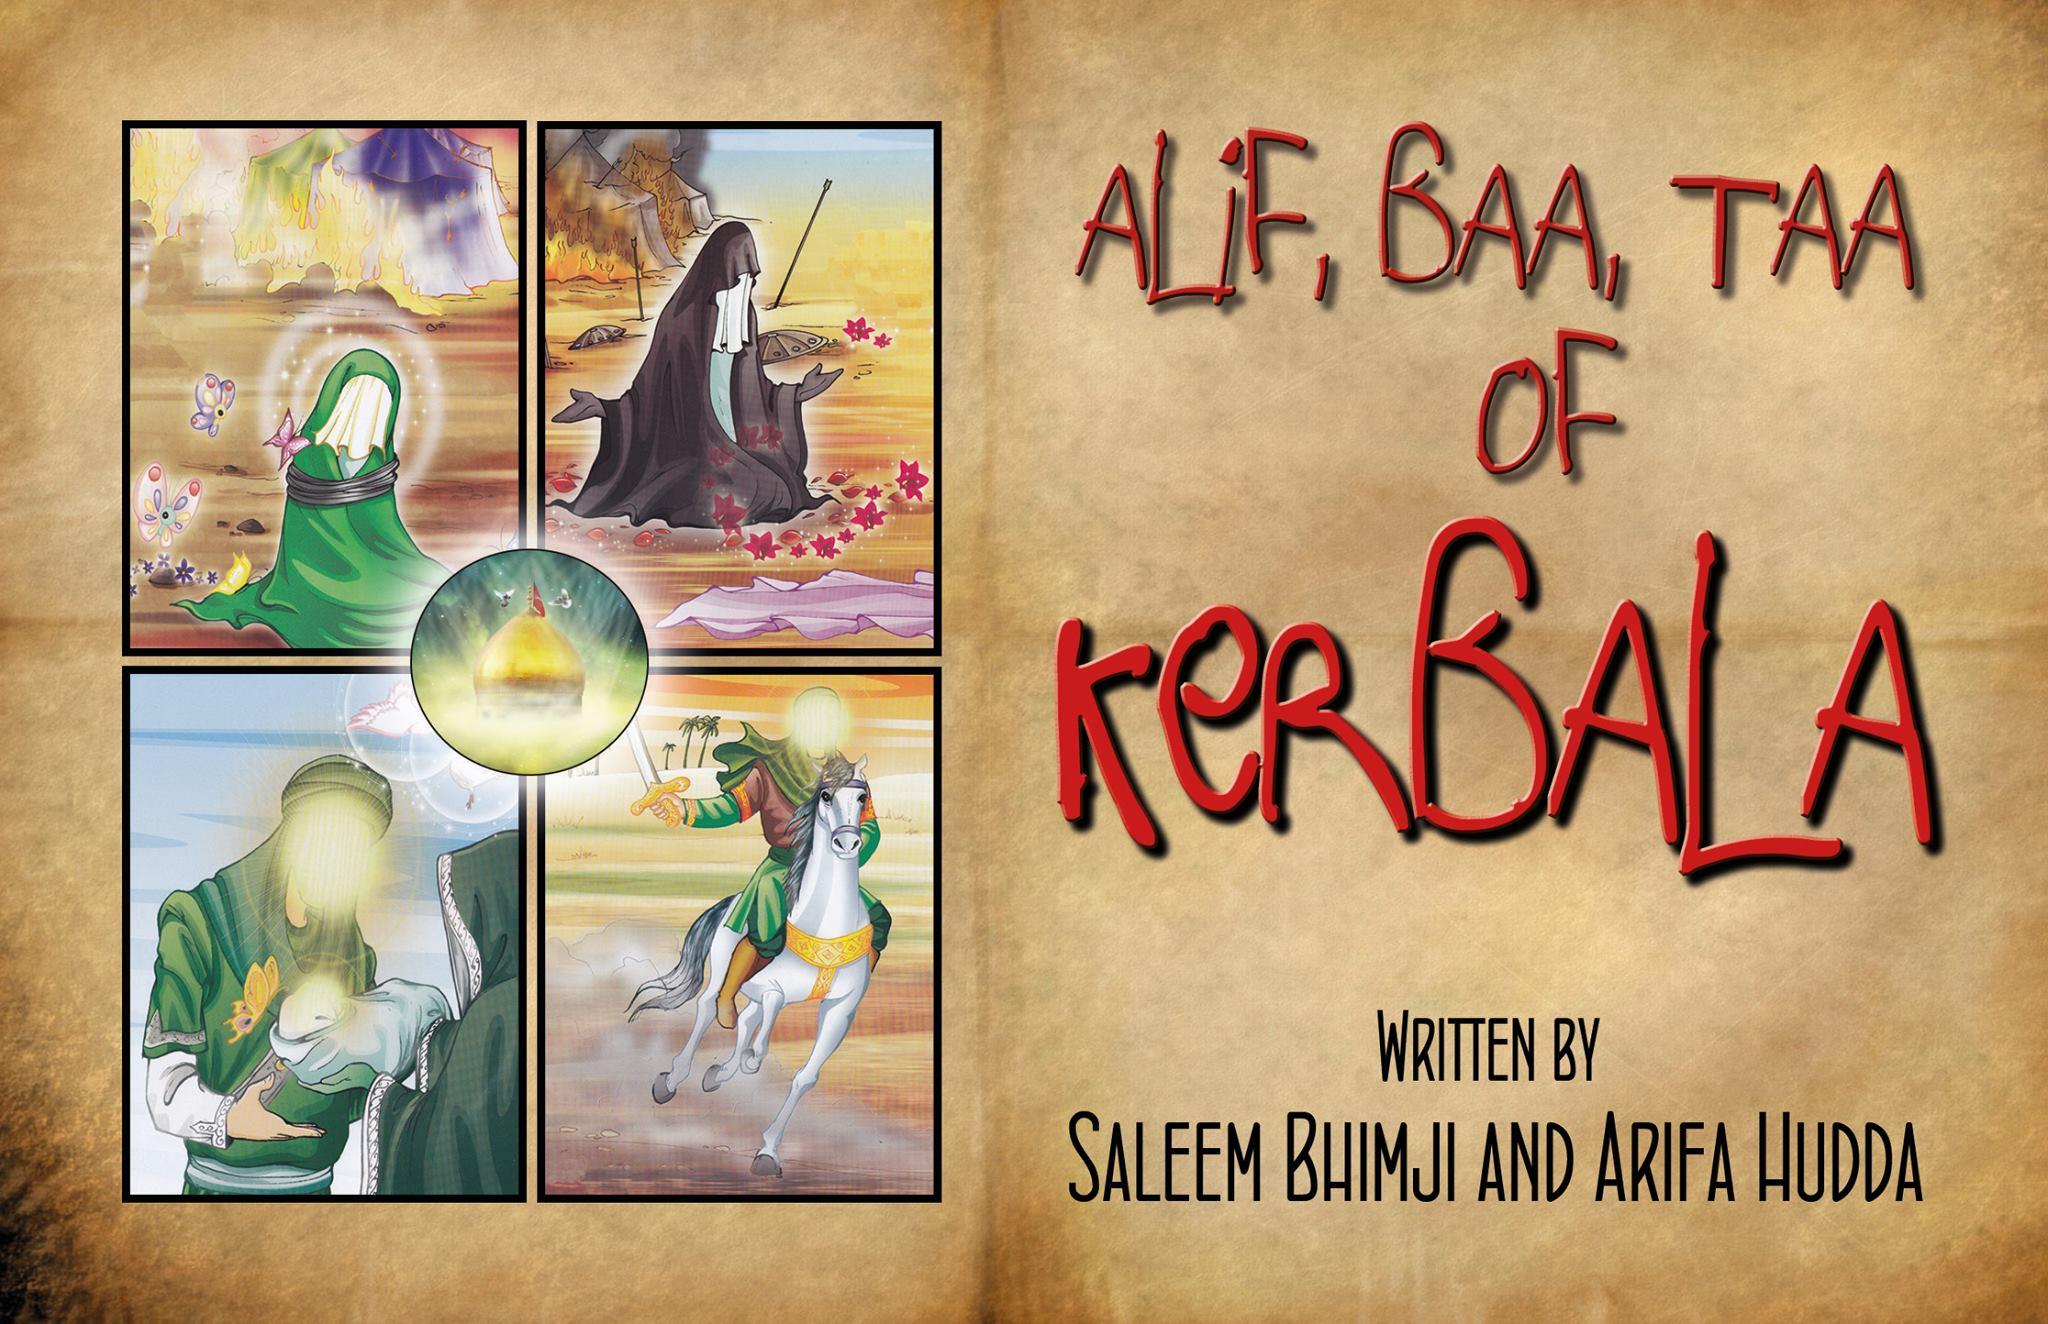 Book Review: Alif, Baa, Taa of Kerbala | Buzz Ideazz